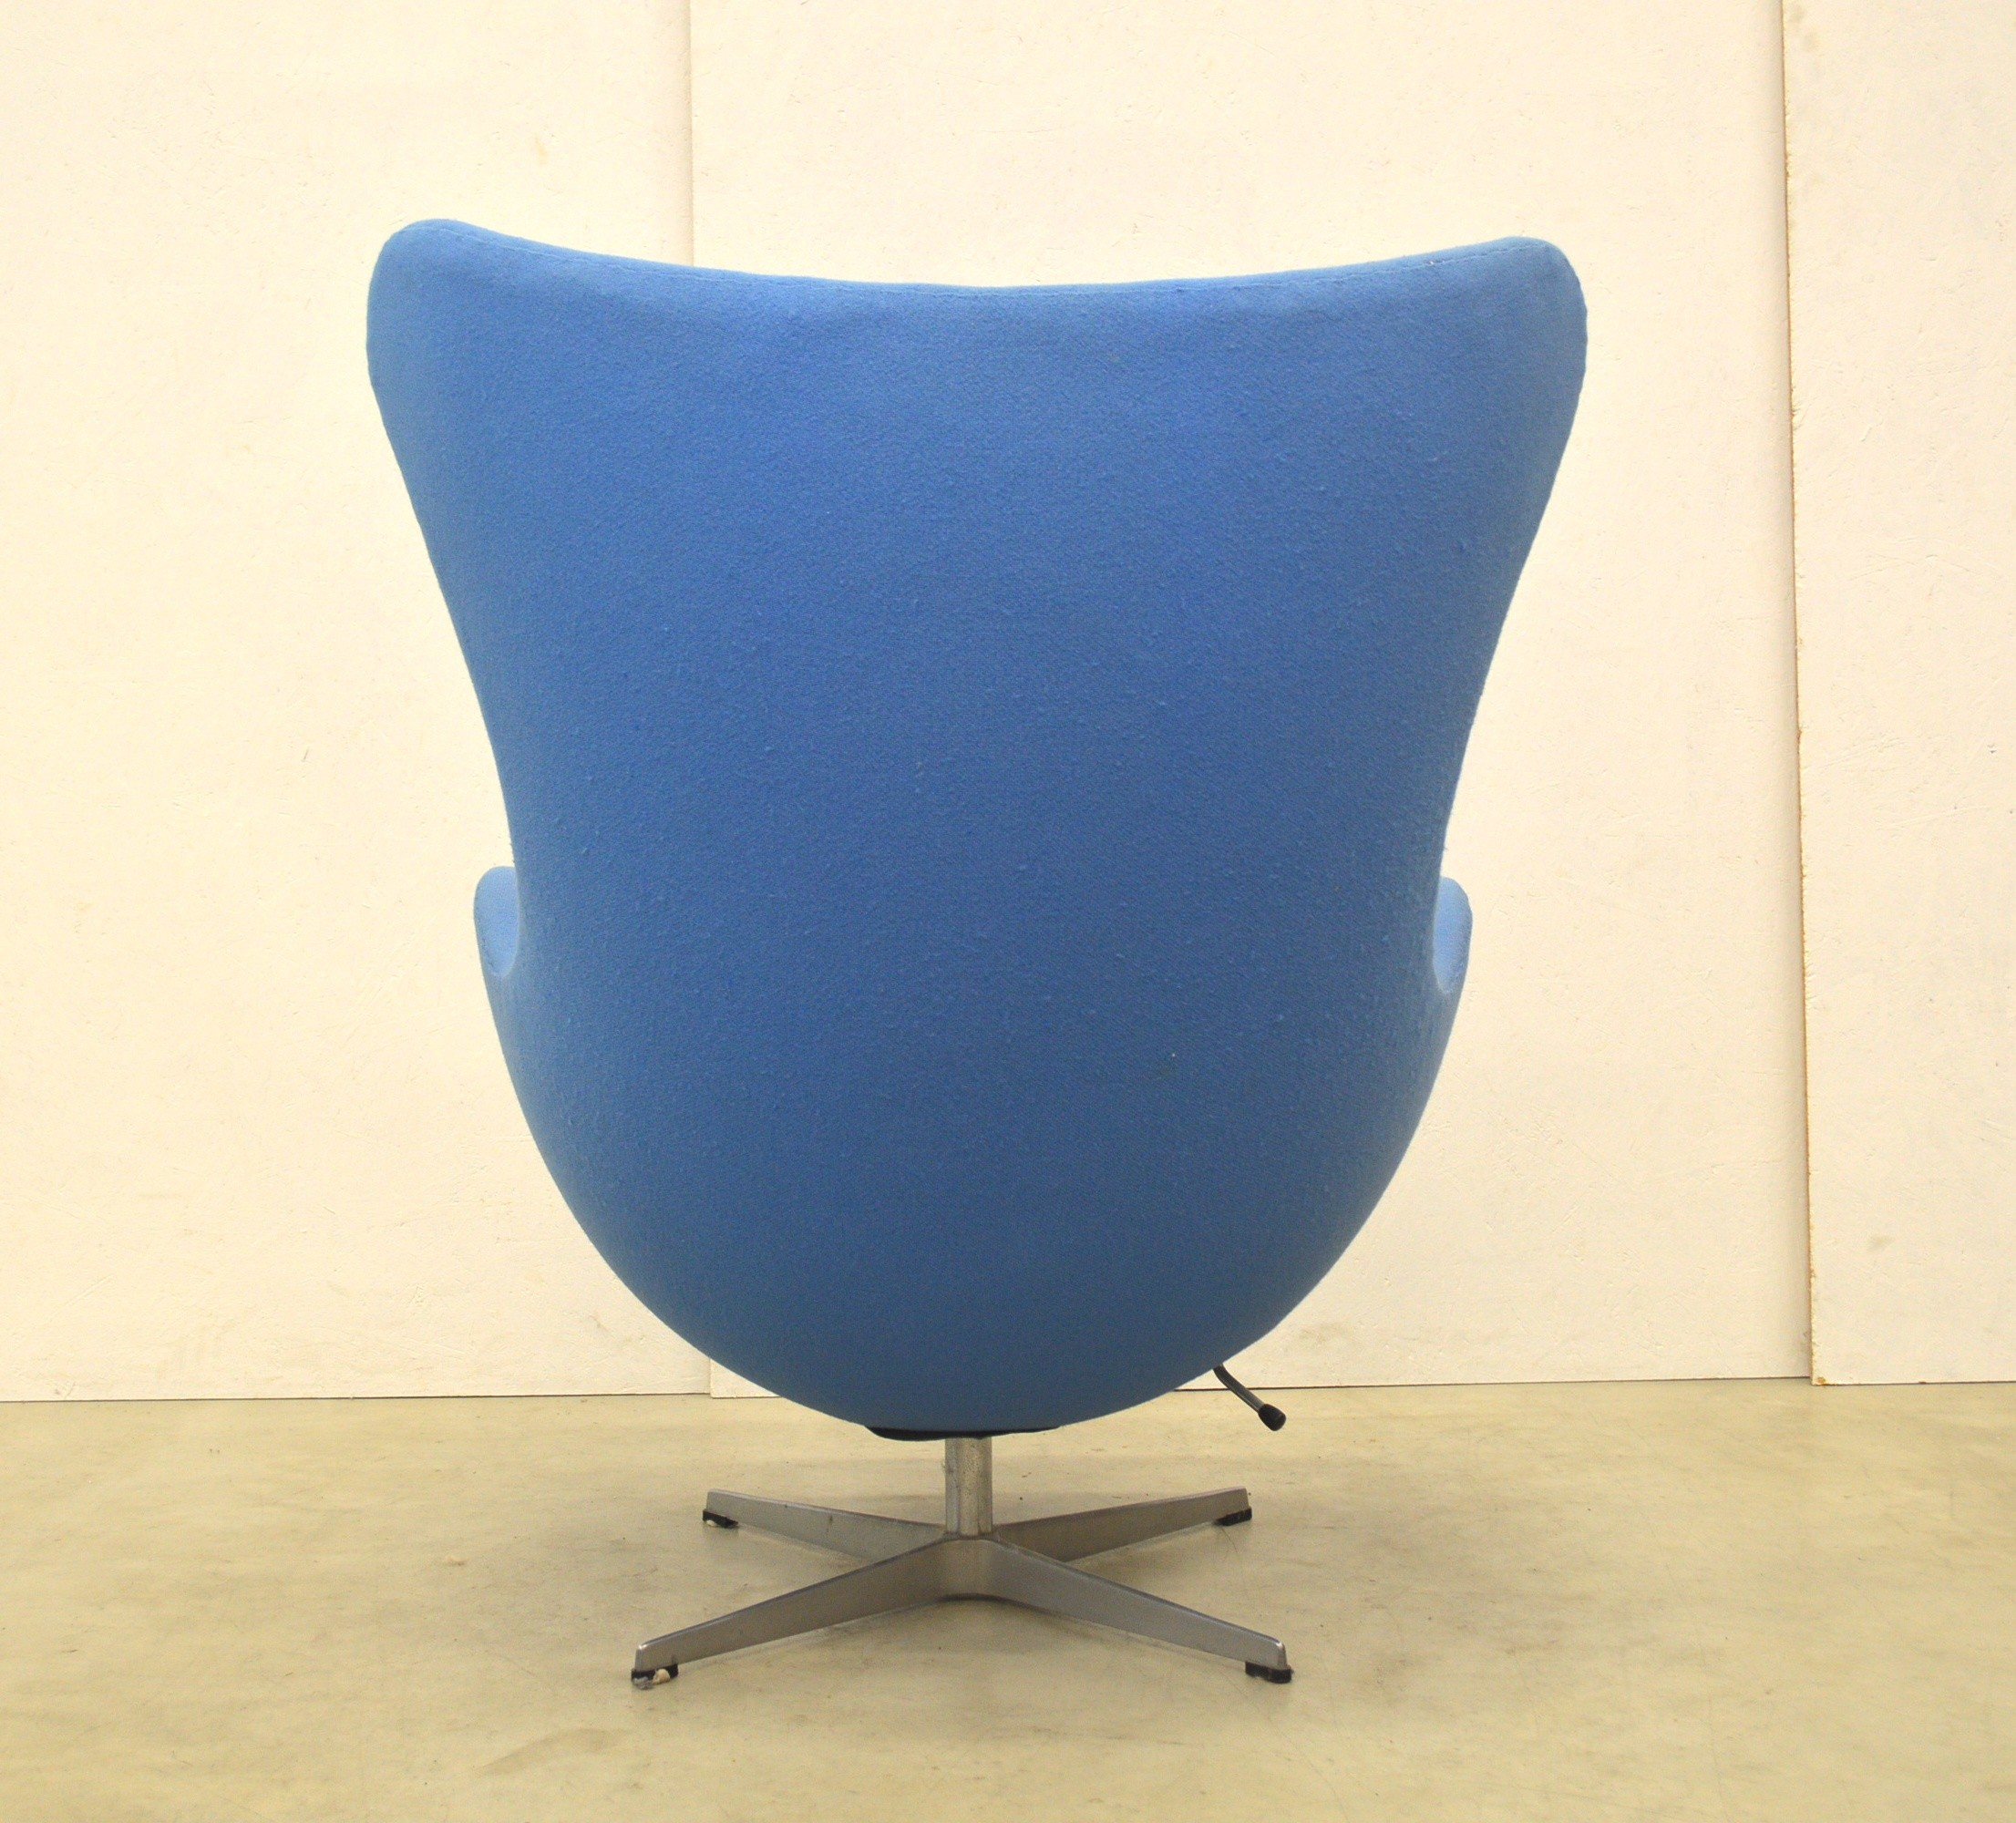 Arne Jacobsen Egg Chair Ottoman By Fritz Hansen 1970 Design Market